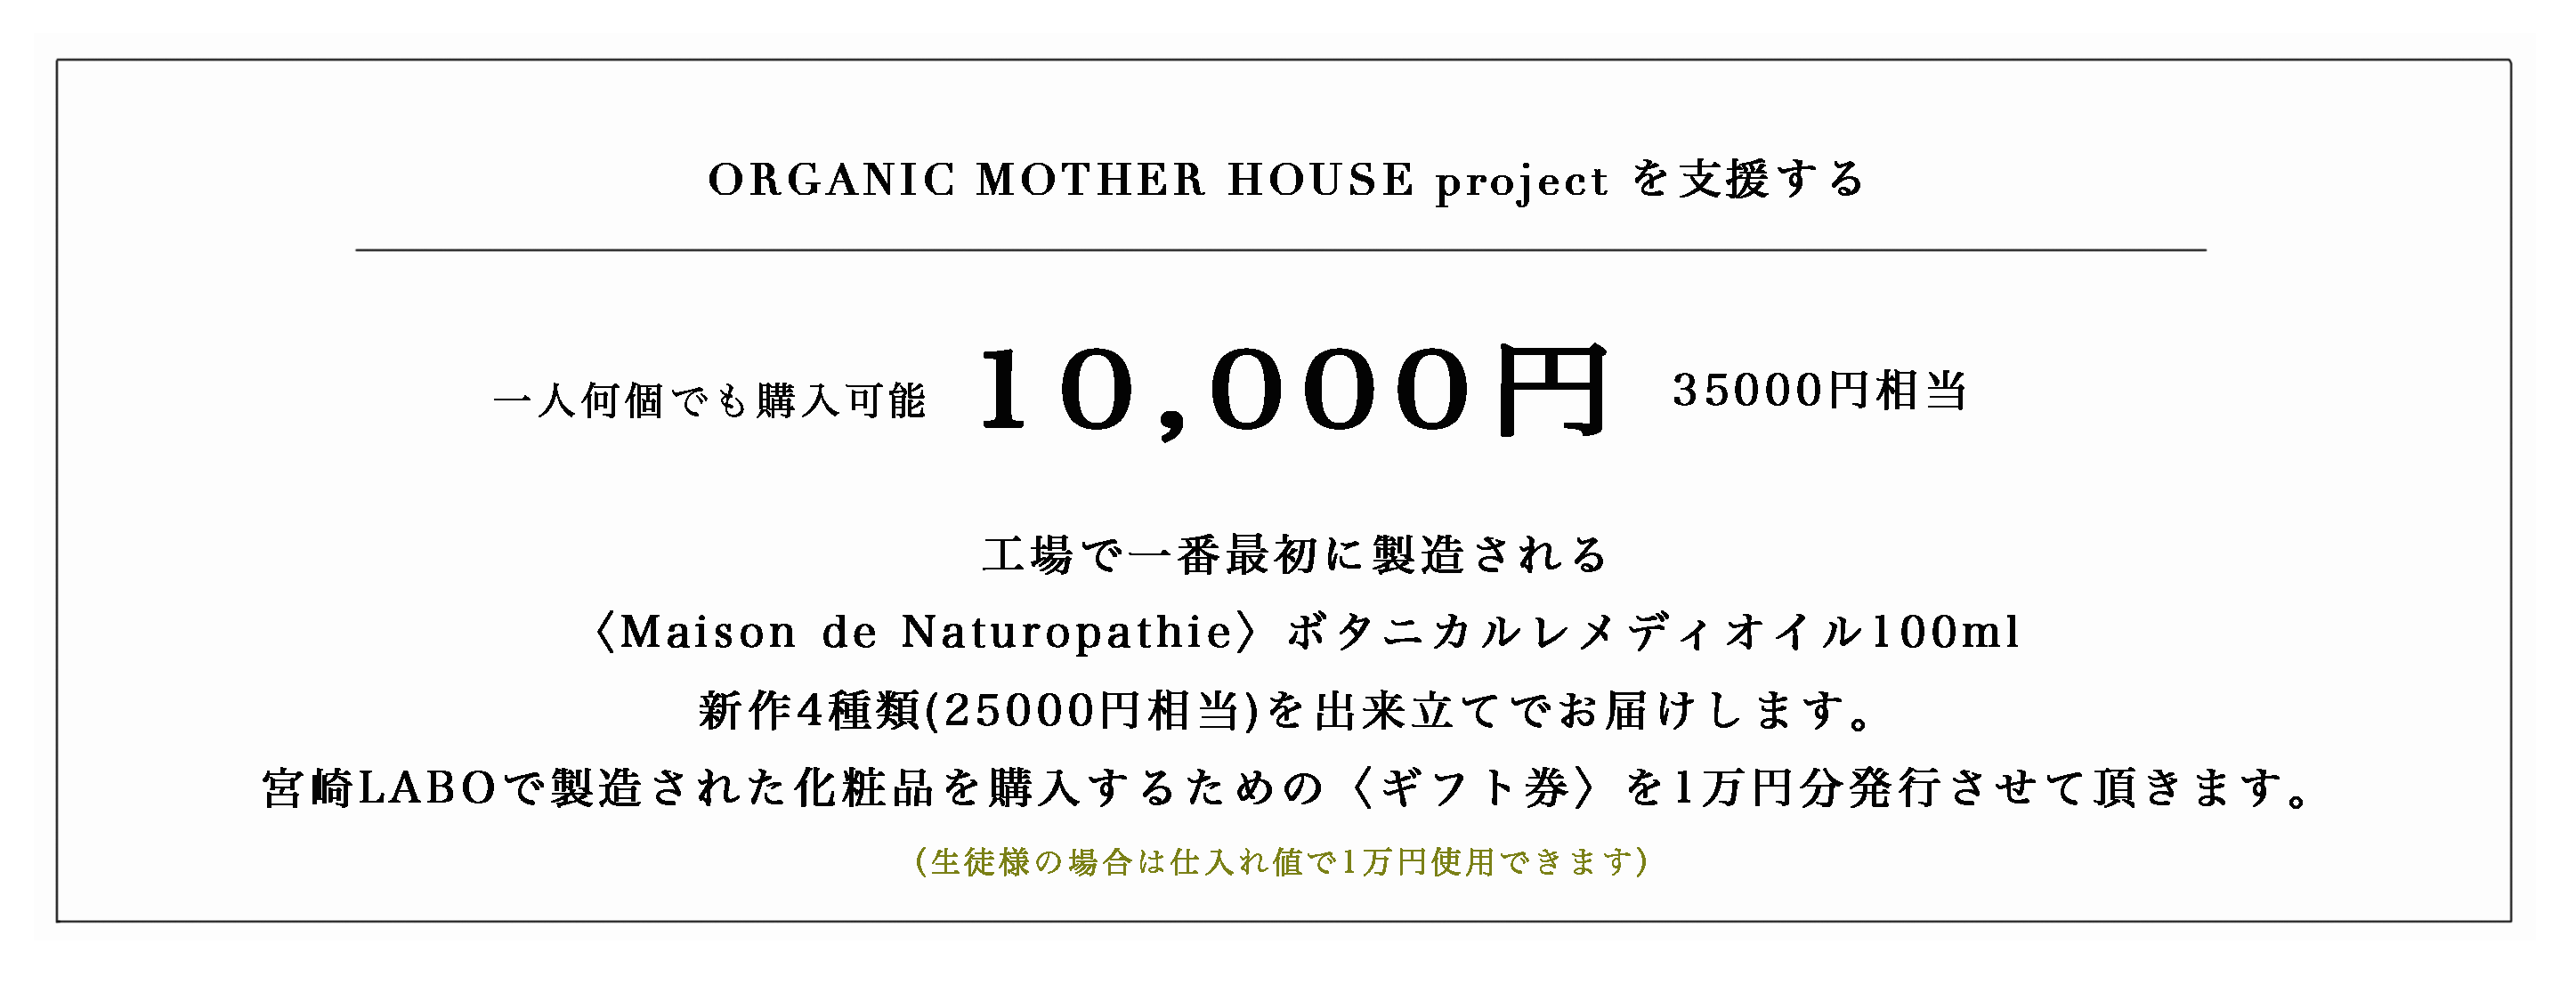 ORGANIC MOTHER HOUSE〈植物調合美容研究所〉1万